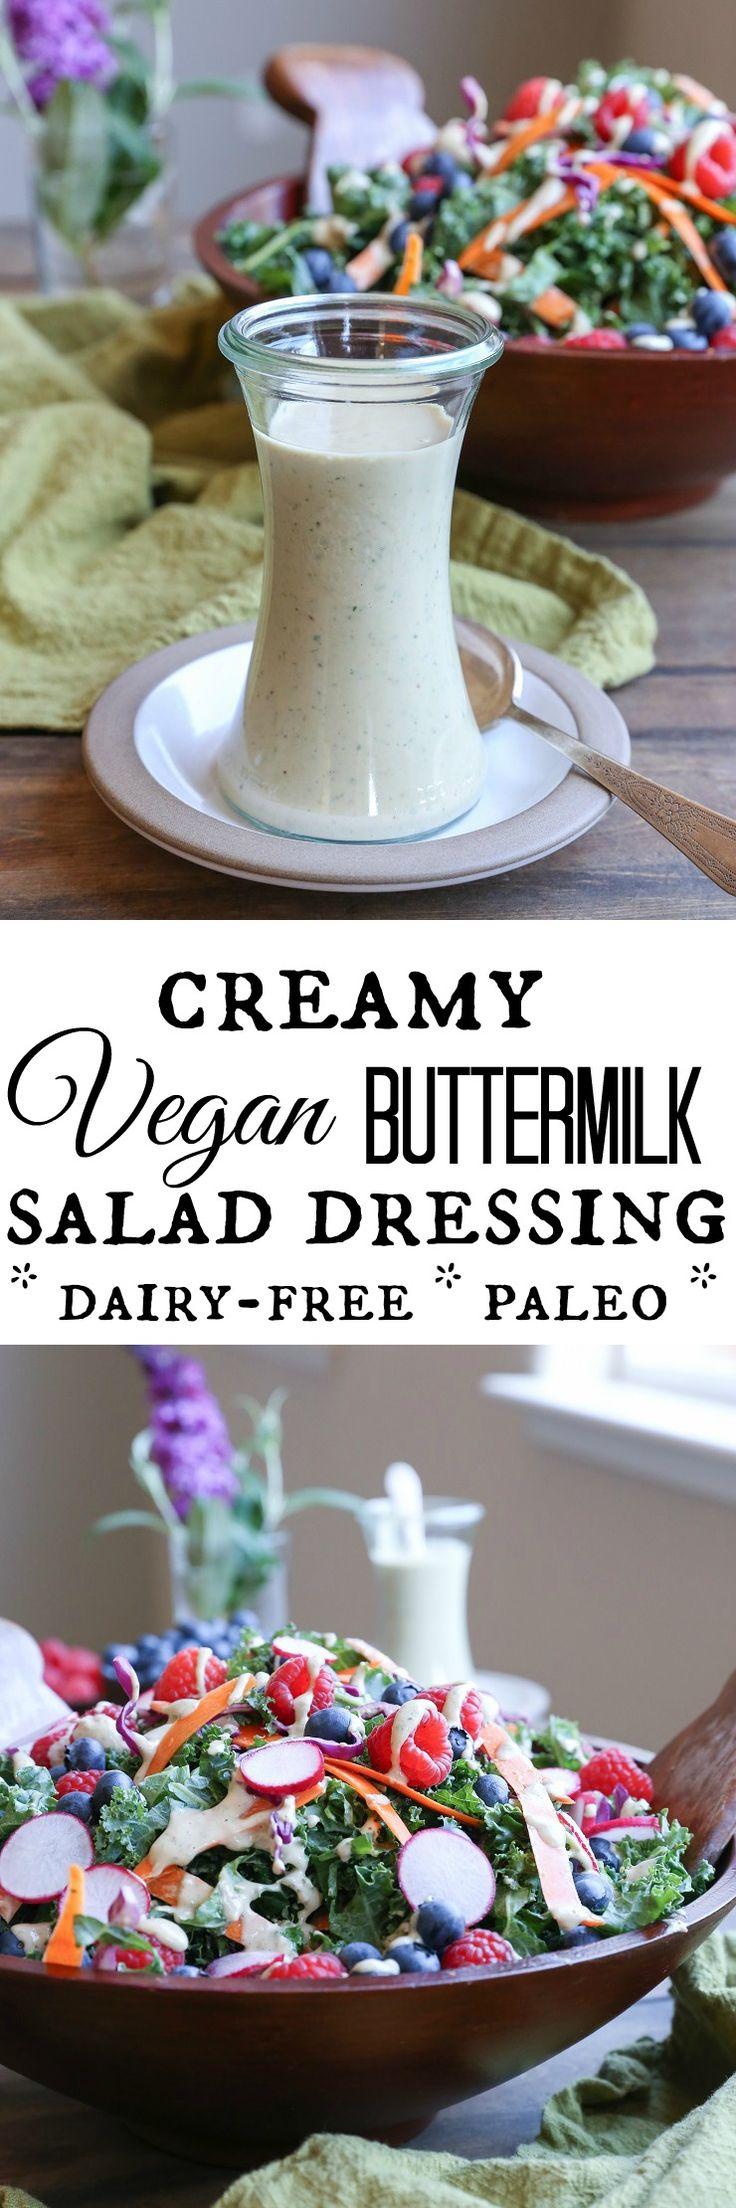 "Vegan Buttermilk Salad Dressing - creamy, delicious vegan ""buttermilk"" dressing that only requires a handful of ingredients and is paleo friendly #vegan #vegetarian #salad #recipe"